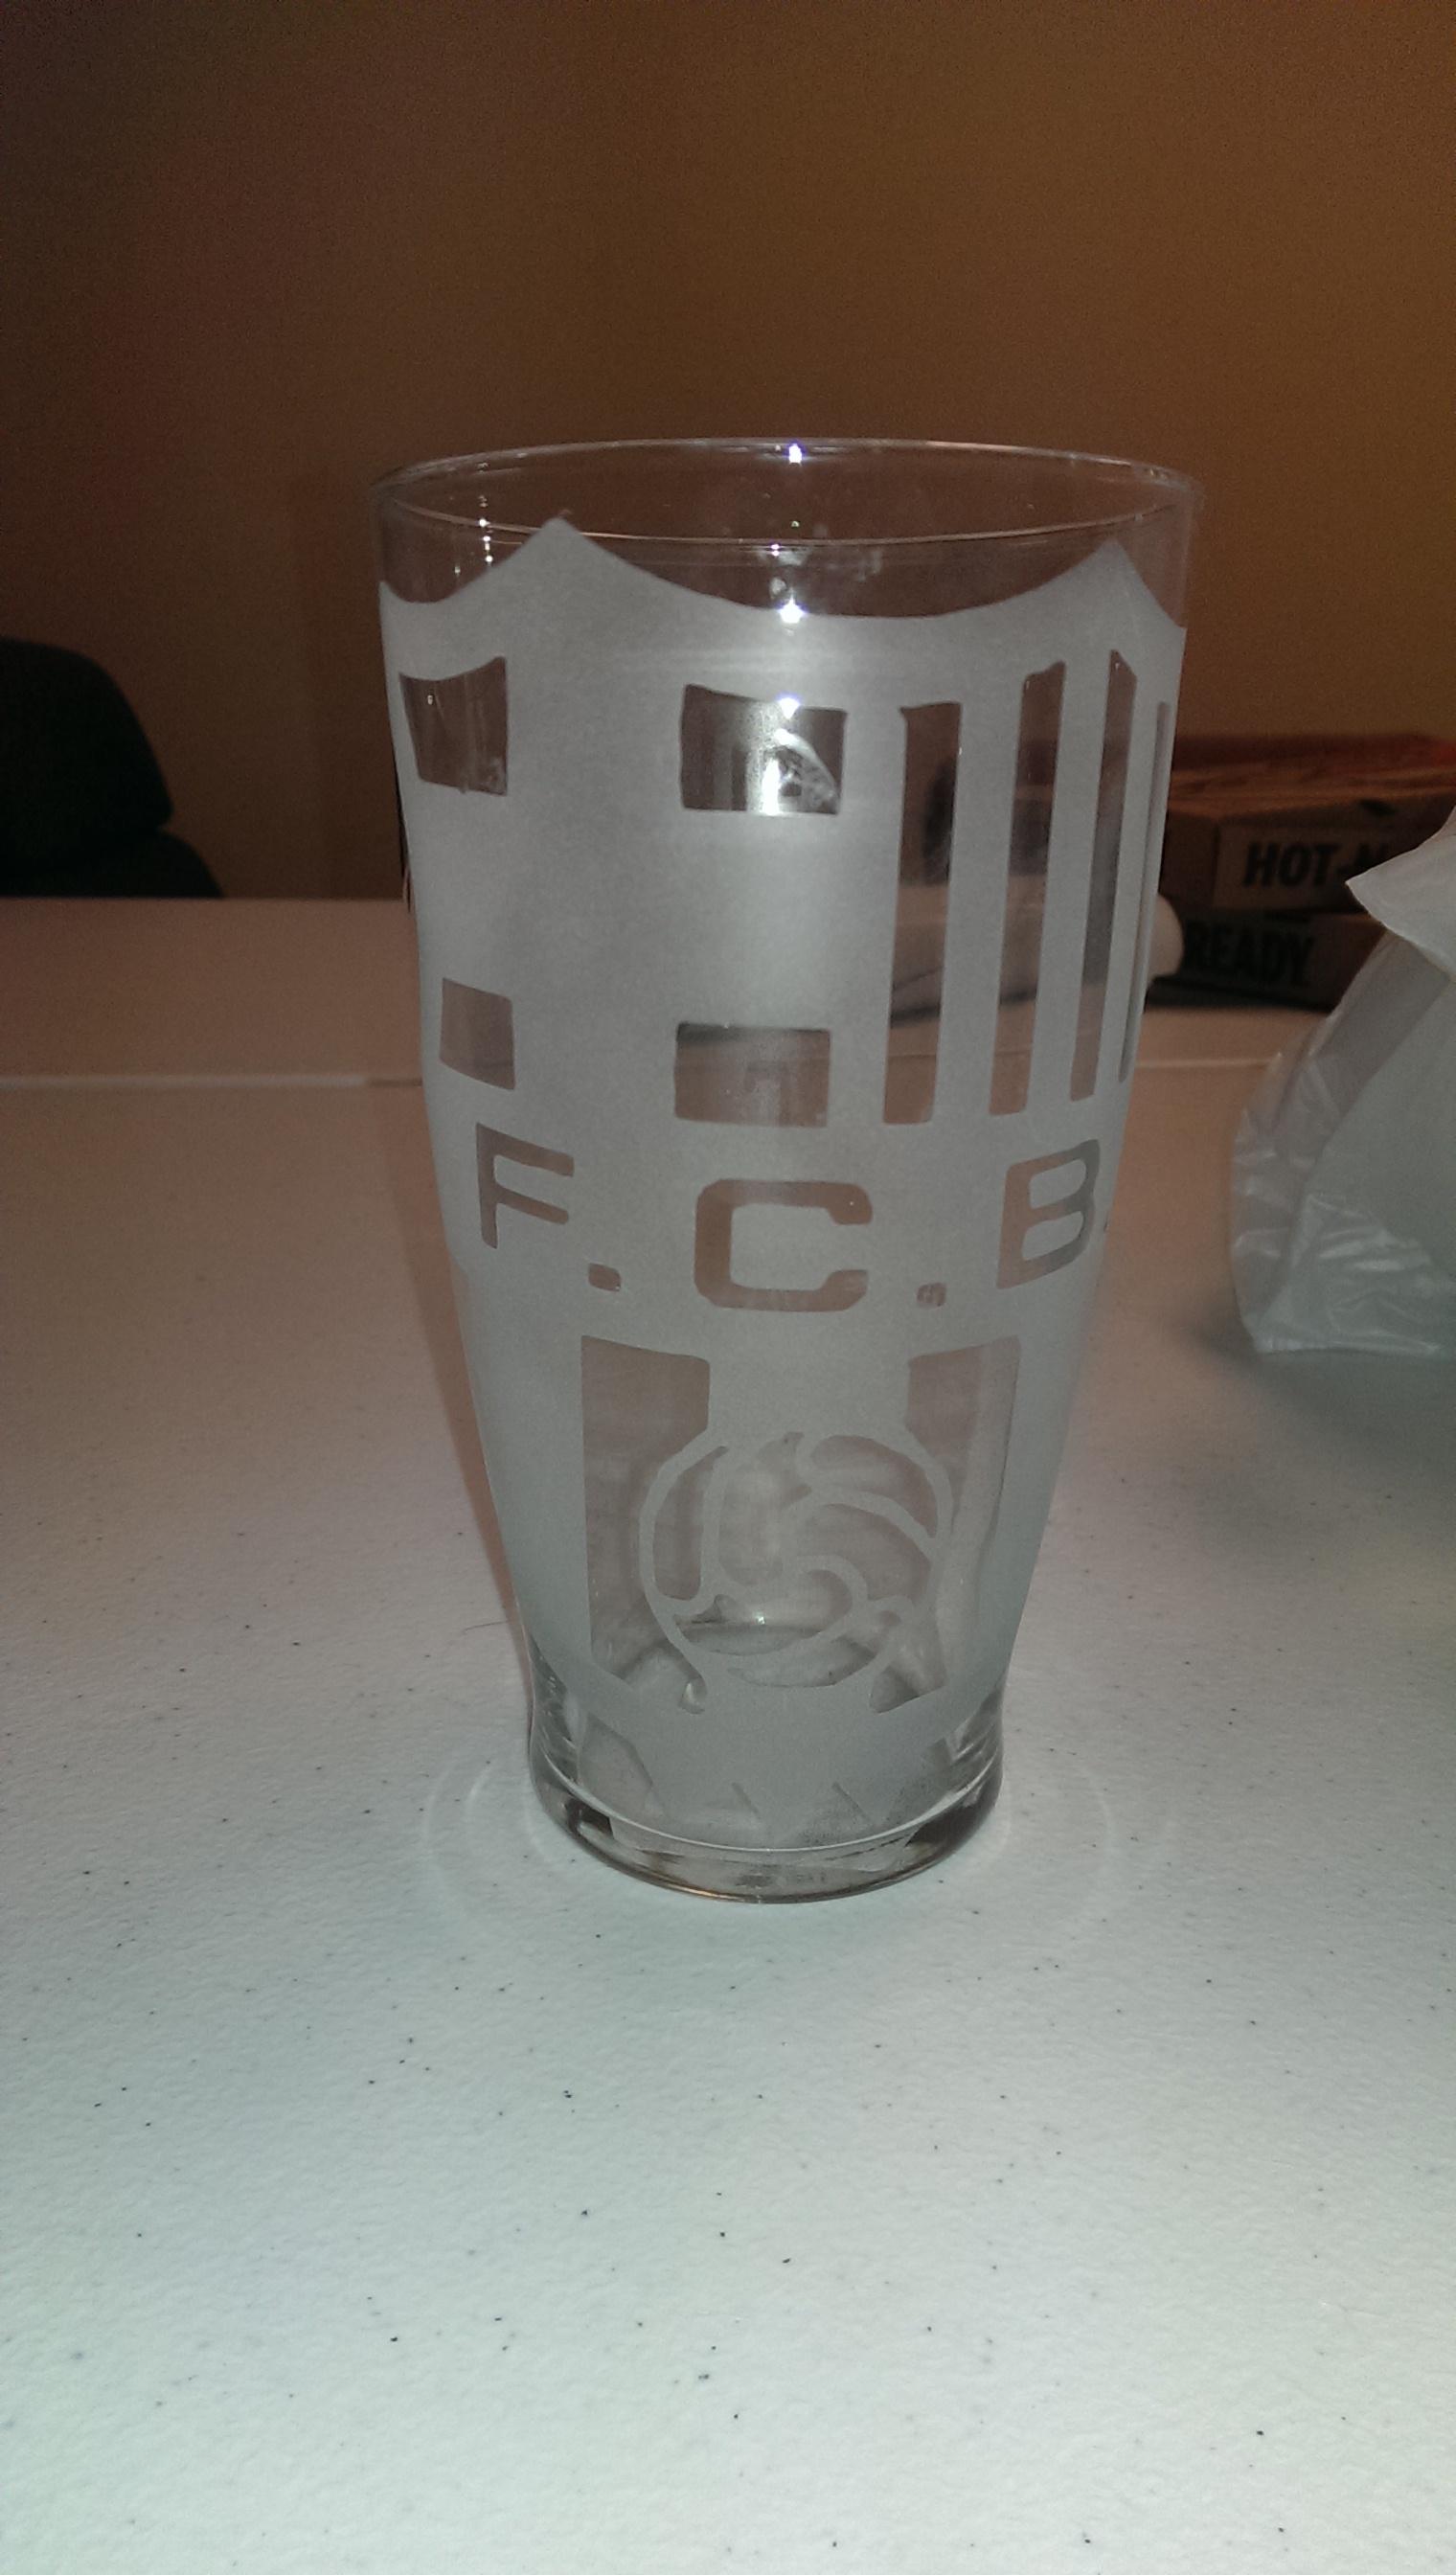 Eric's FCB (Barcelona) Mug